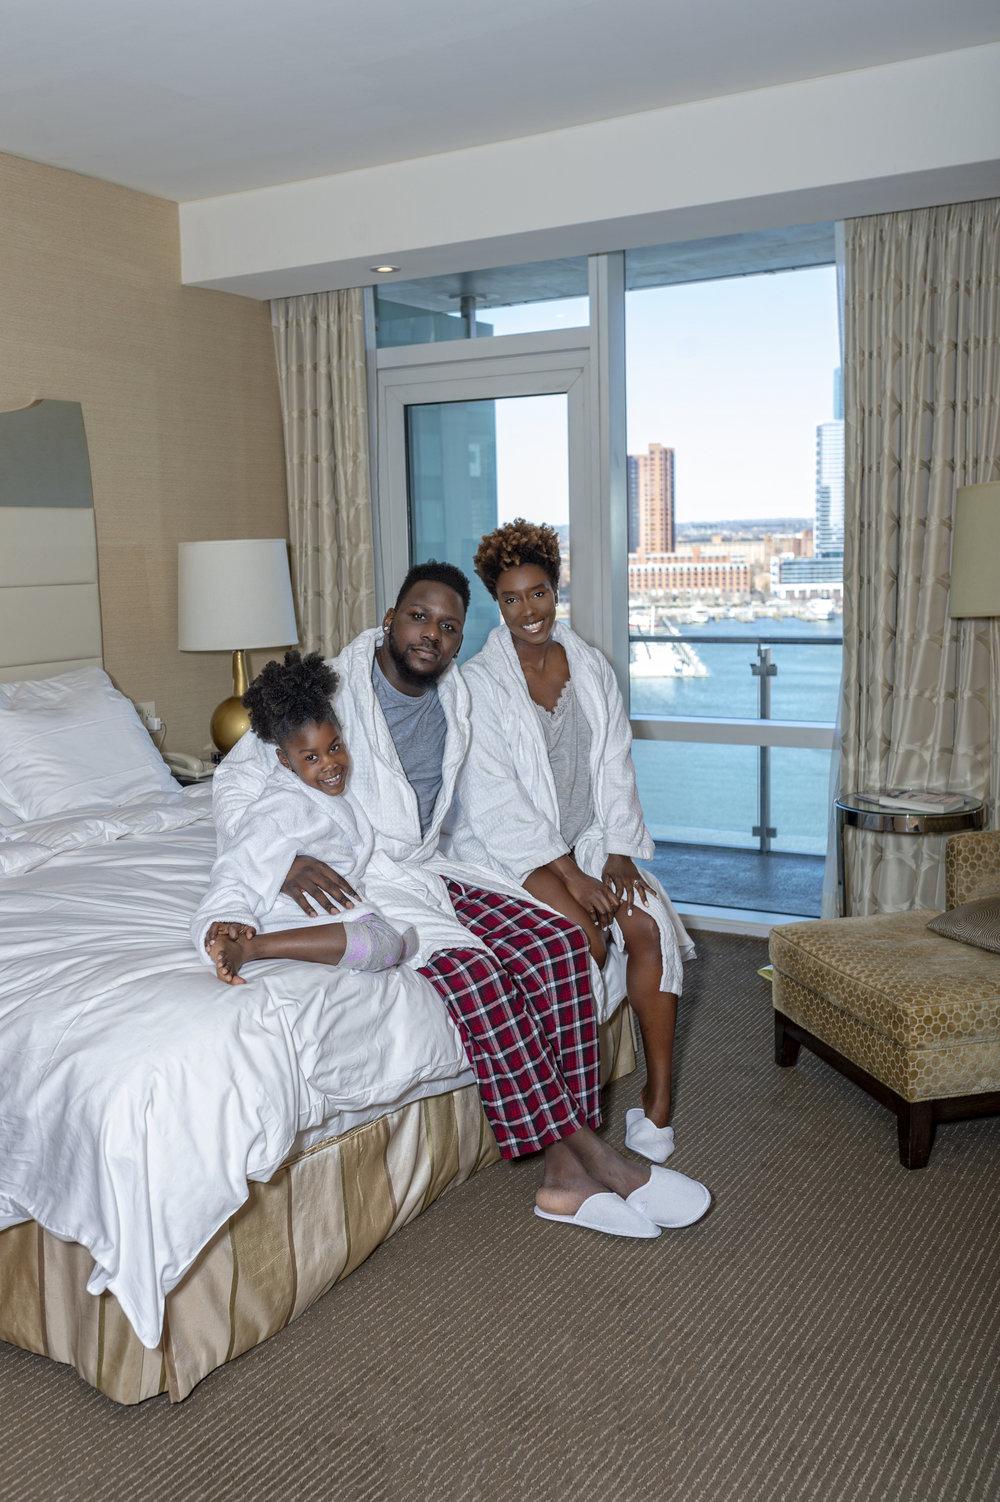 Four-Seasons-Baltimore-Family-Staycation-Daynabolden-family.jpg